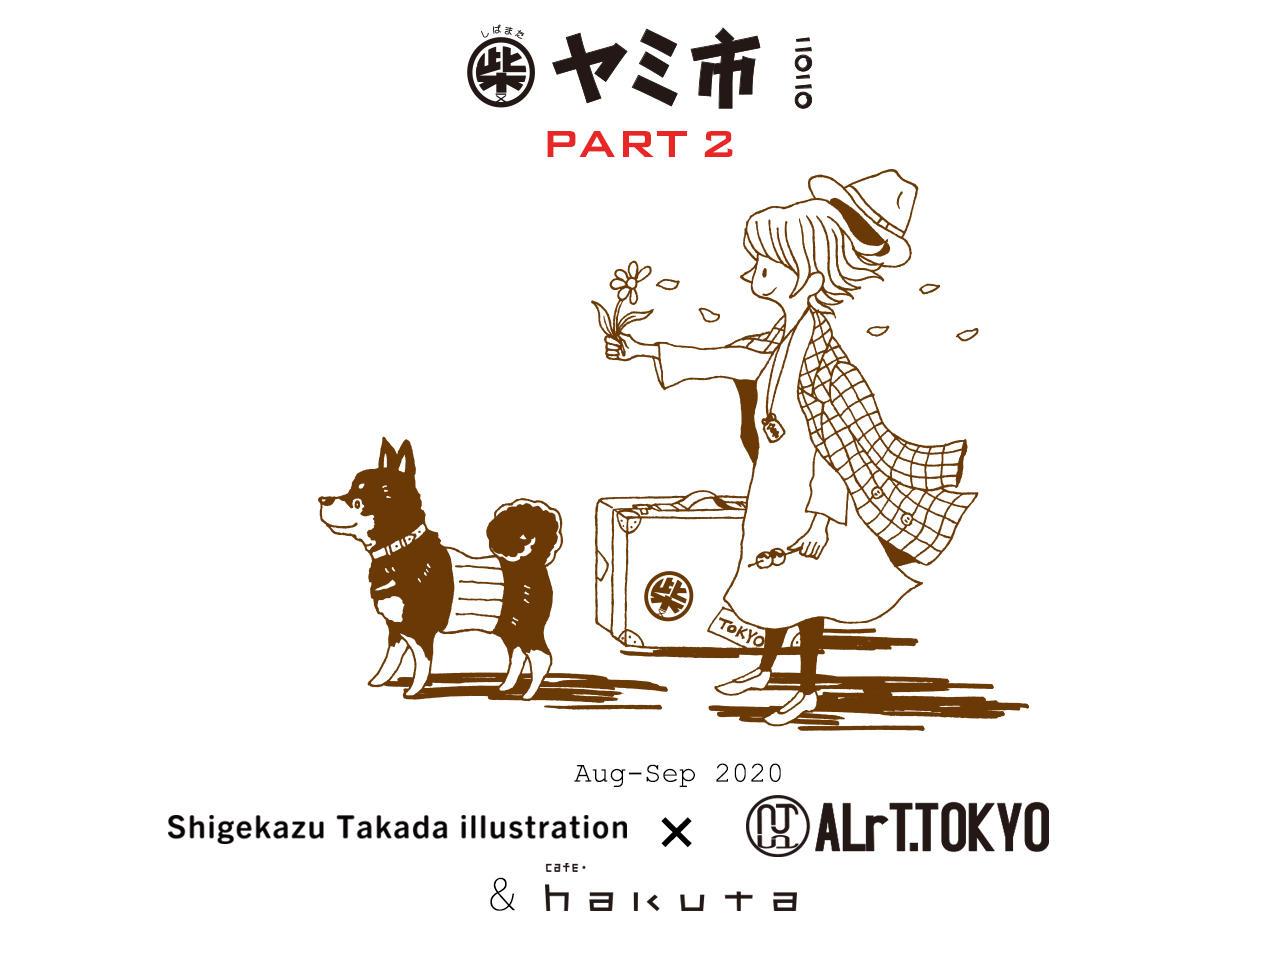 http://alrt.tokyo/news/takada_collabo_image.jpg